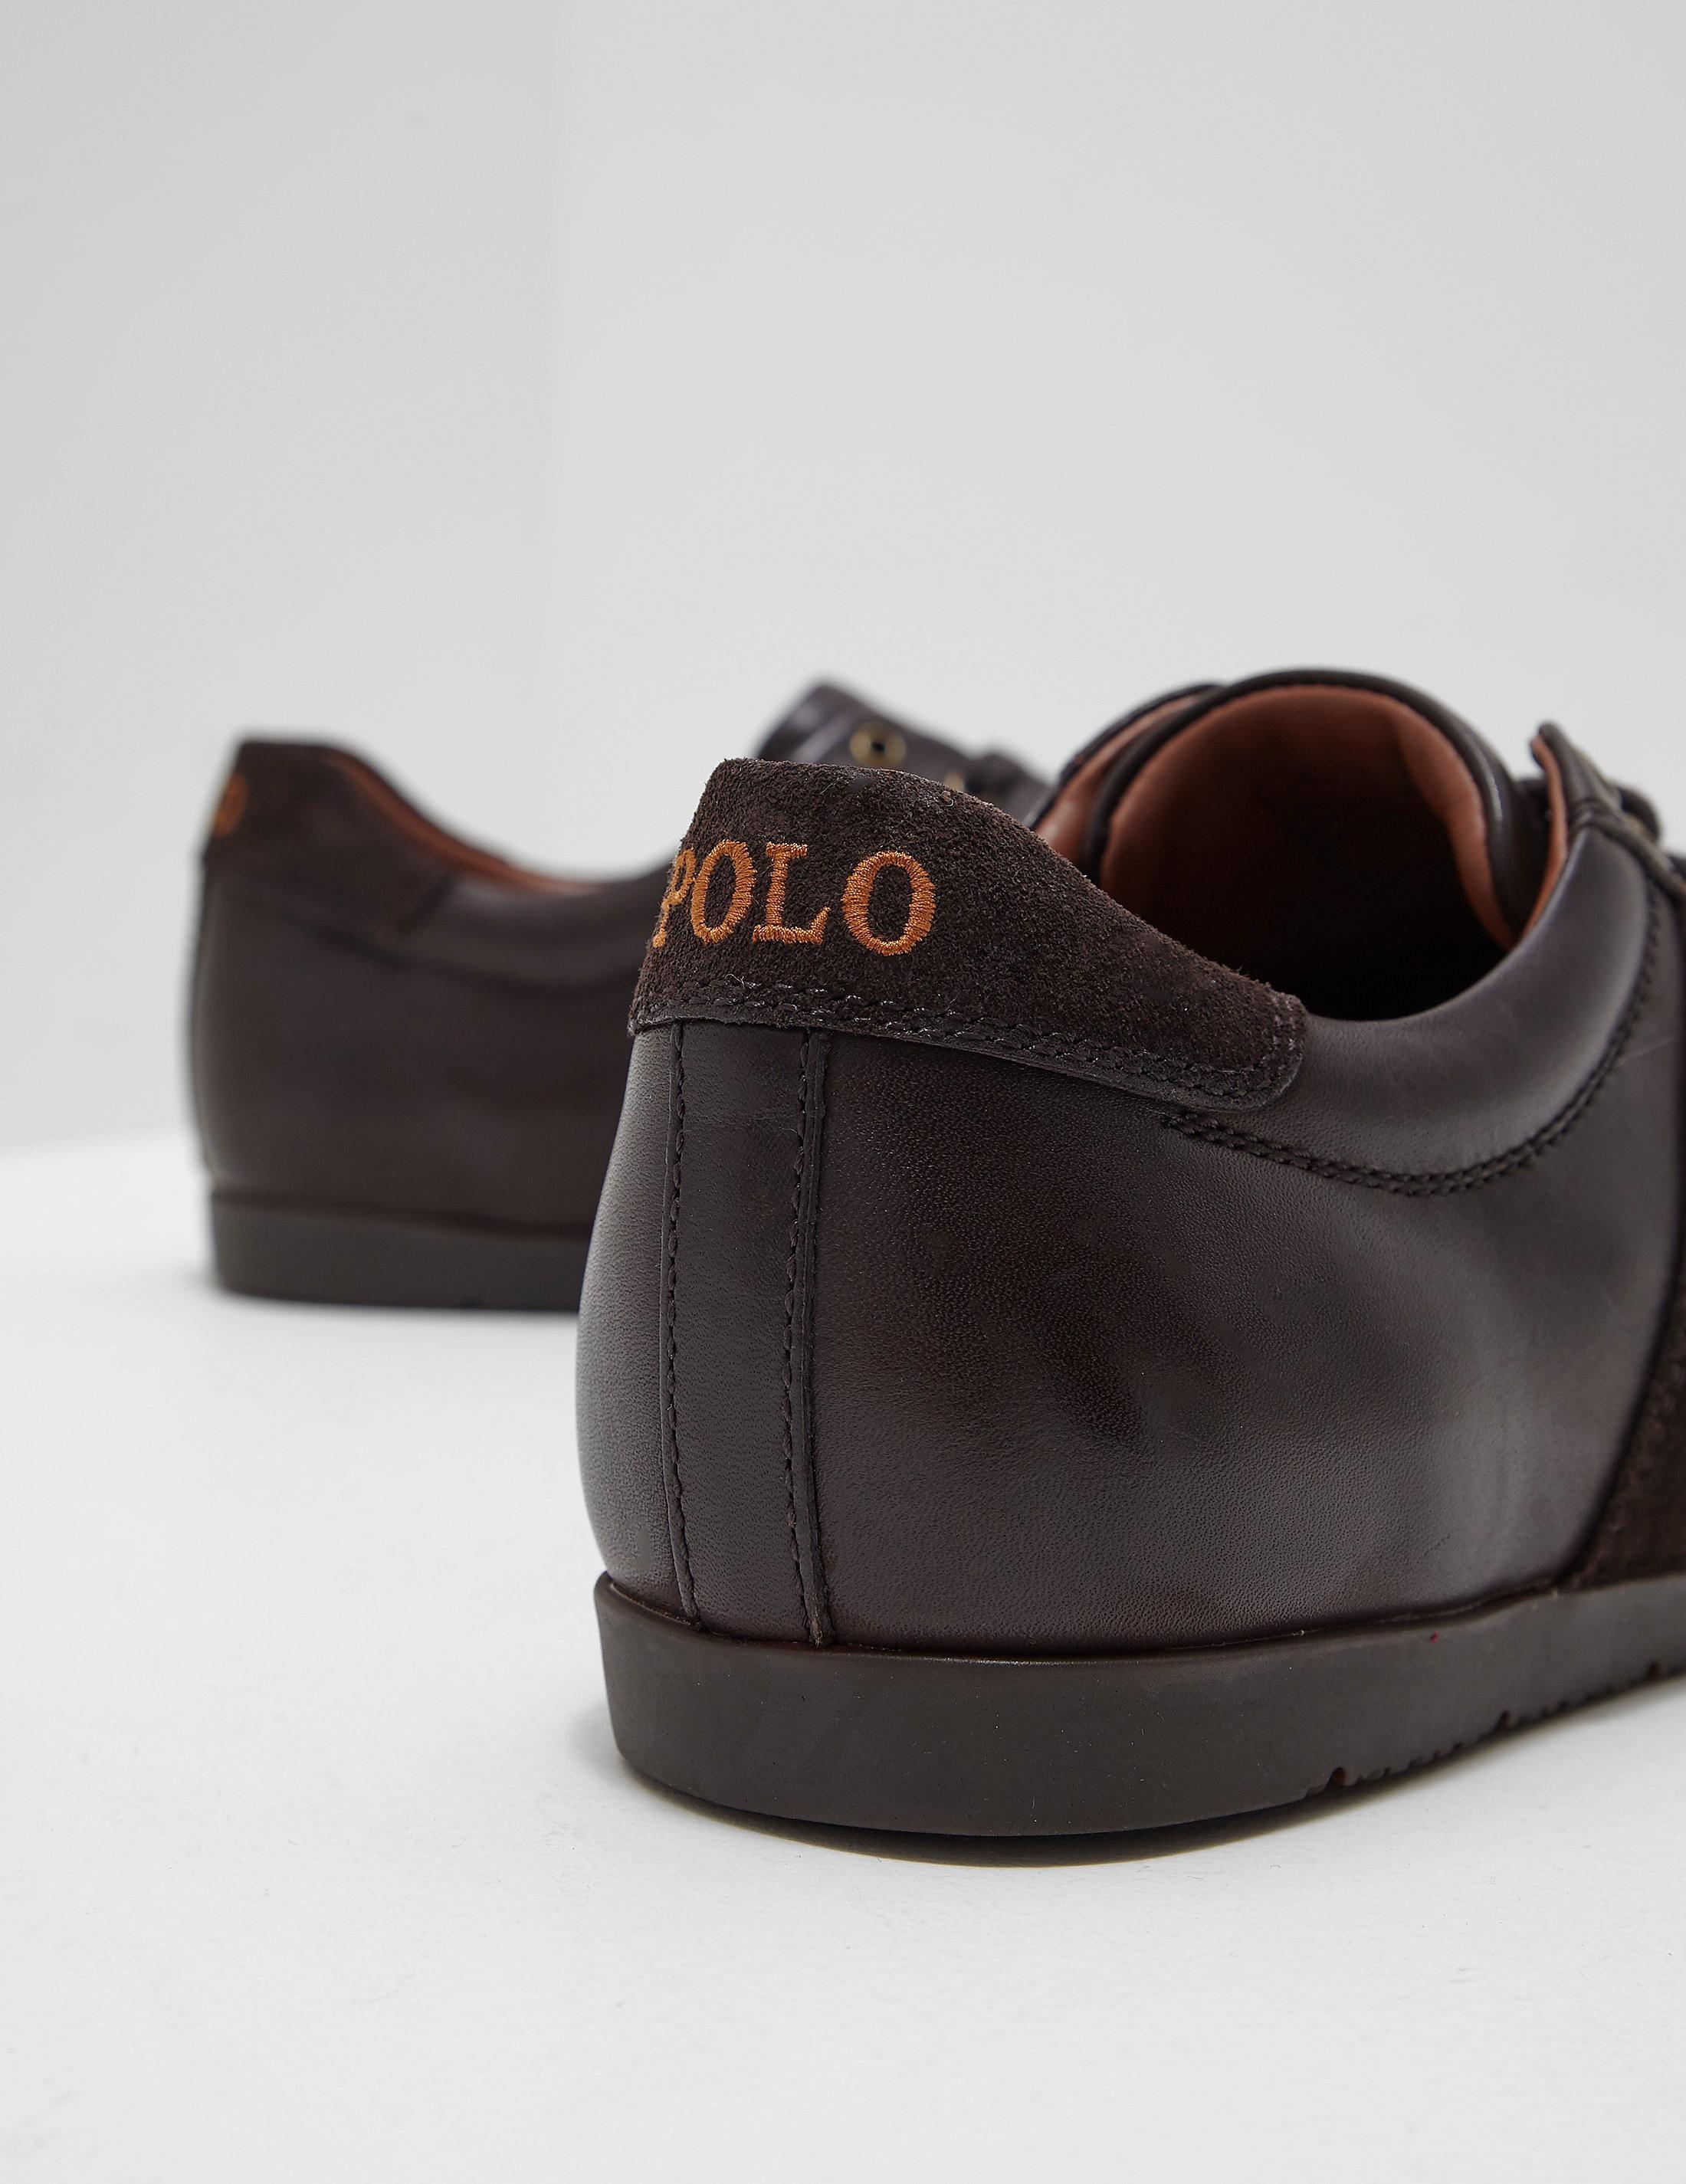 Polo Ralph Lauren Price Trainers